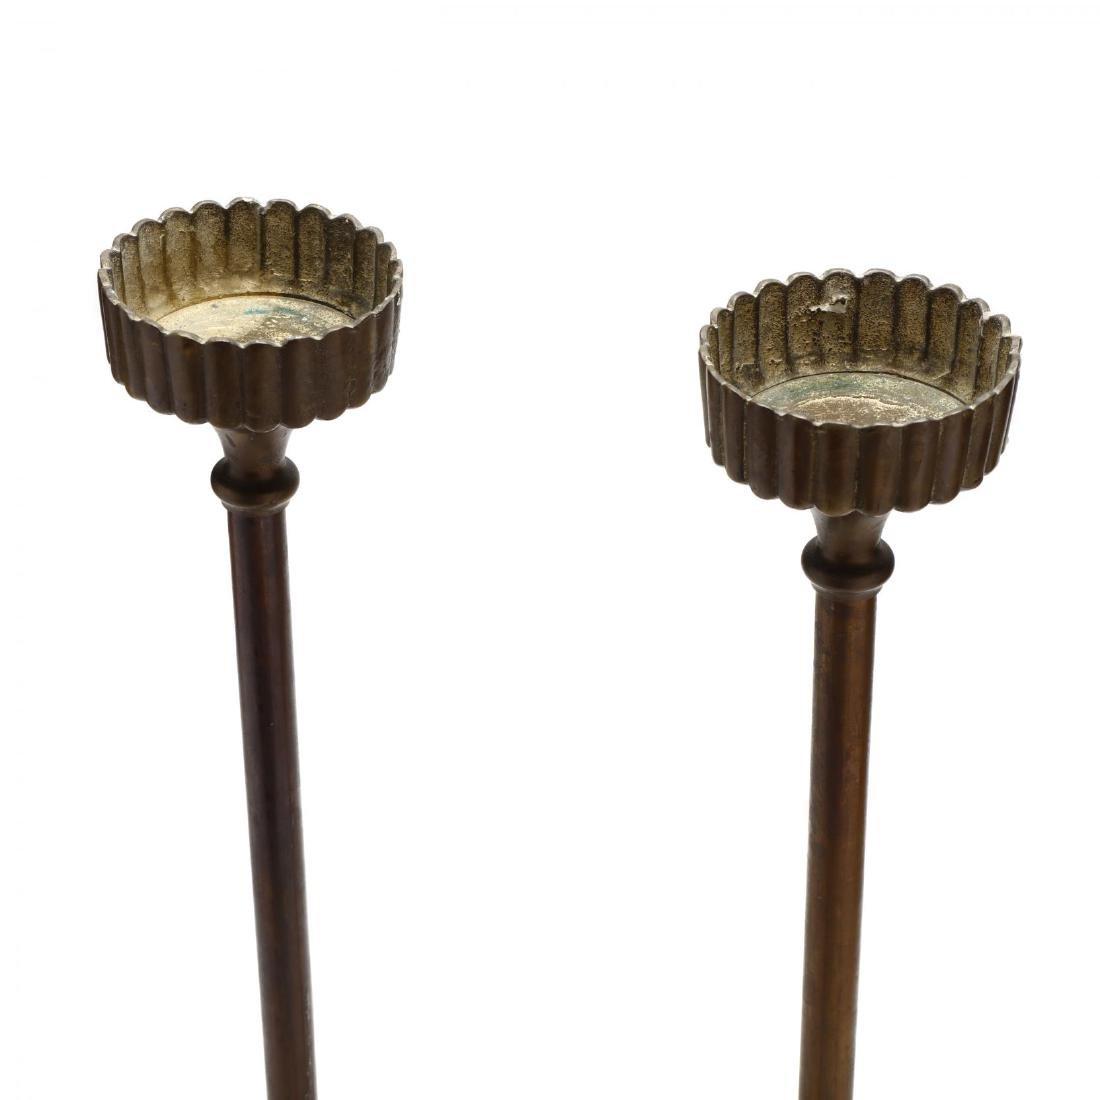 Silvestri, Pair of Modernist Brass Pricket Sticks - 2